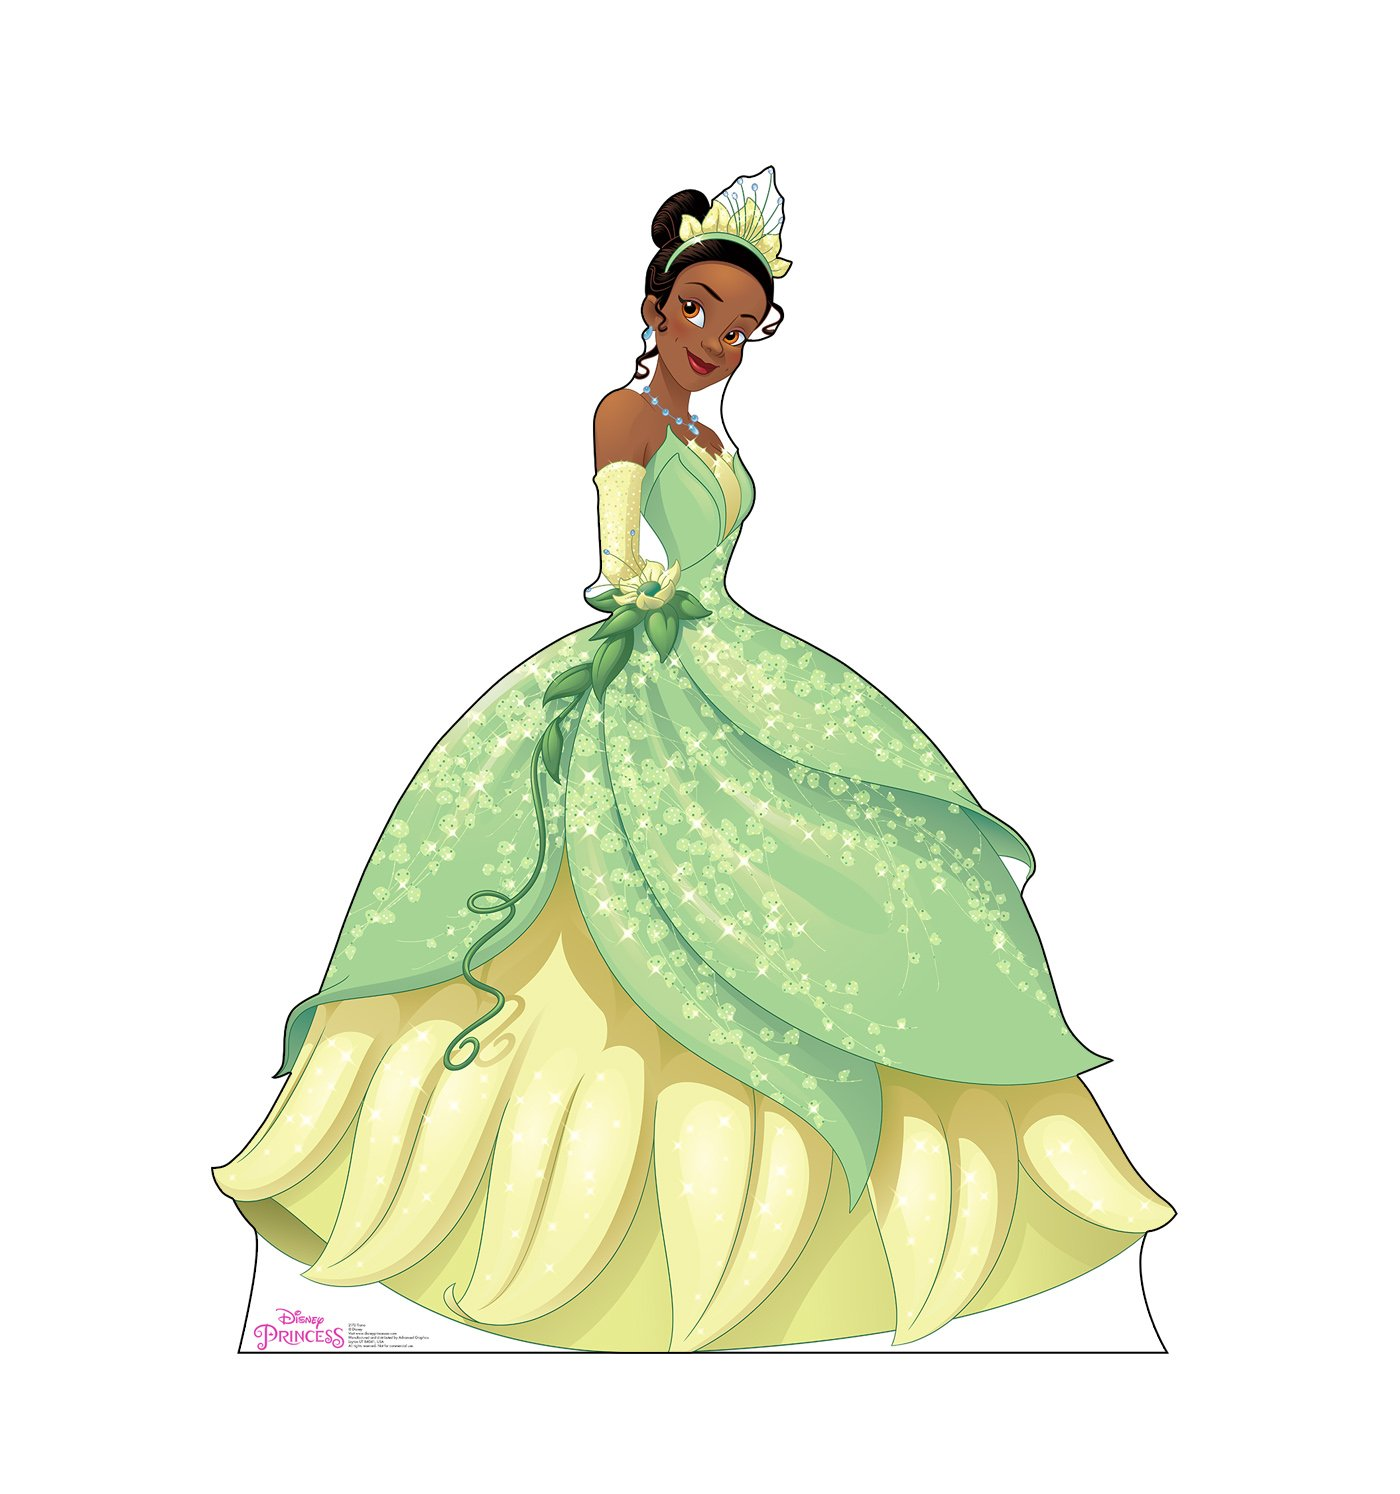 Advanced Graphics Tiana Life Size Cardboard Cutout Standup - Disney Princess Friendship Adventures